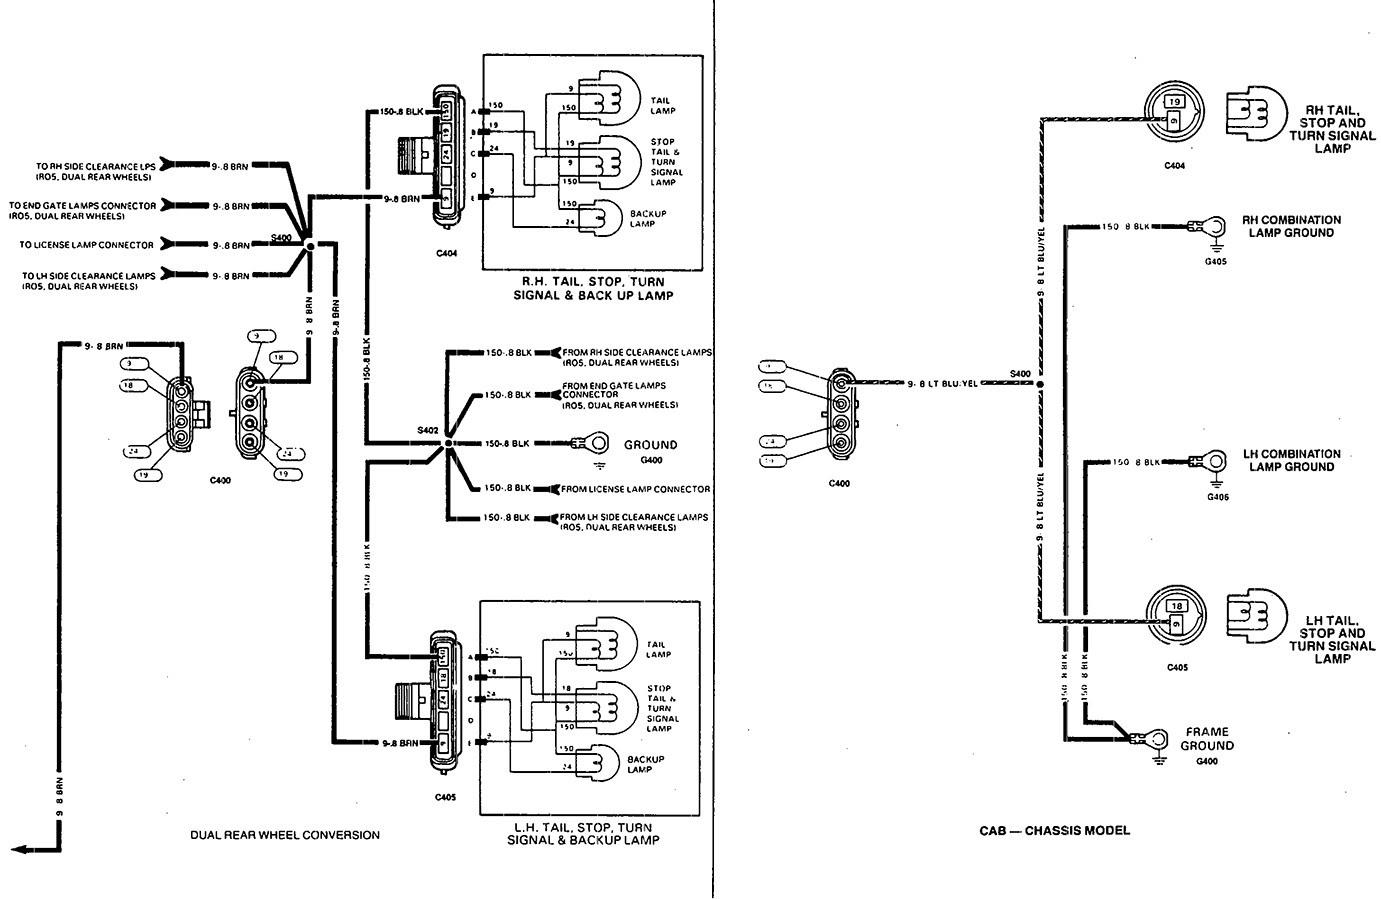 Ford F 250 Tail Light Wiring Diagram Wiring Diagram Module B Module B Emilia Fise It